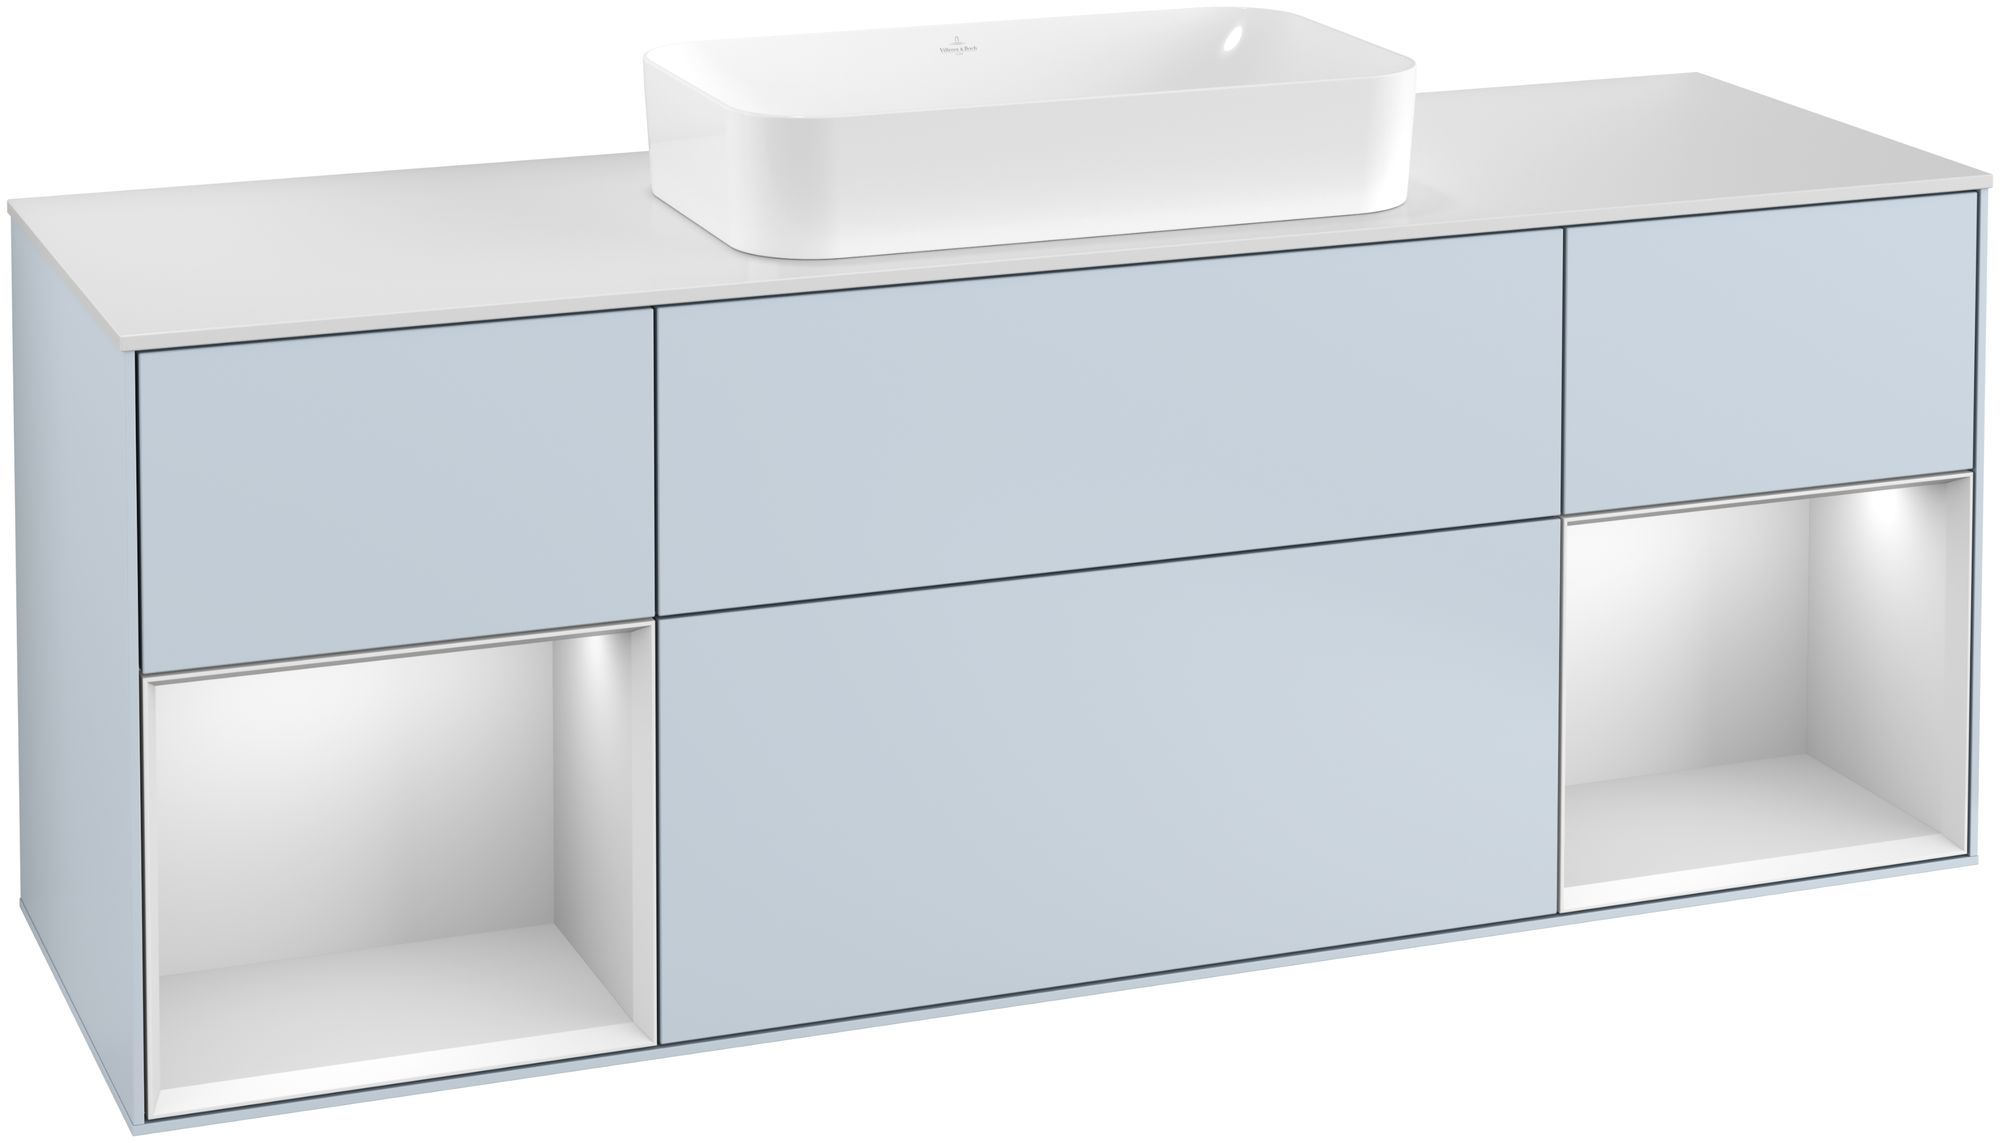 Villeroy & Boch Finion G33 Waschtischunterschrank mit Regalelement 4 Auszüge Waschtisch mittig LED-Beleuchtung B:160xH:60,3xT:50,1cm Front, Korpus: Cloud, Regal: Weiß Matt Soft Grey, Glasplatte: White Matt G331MTHA